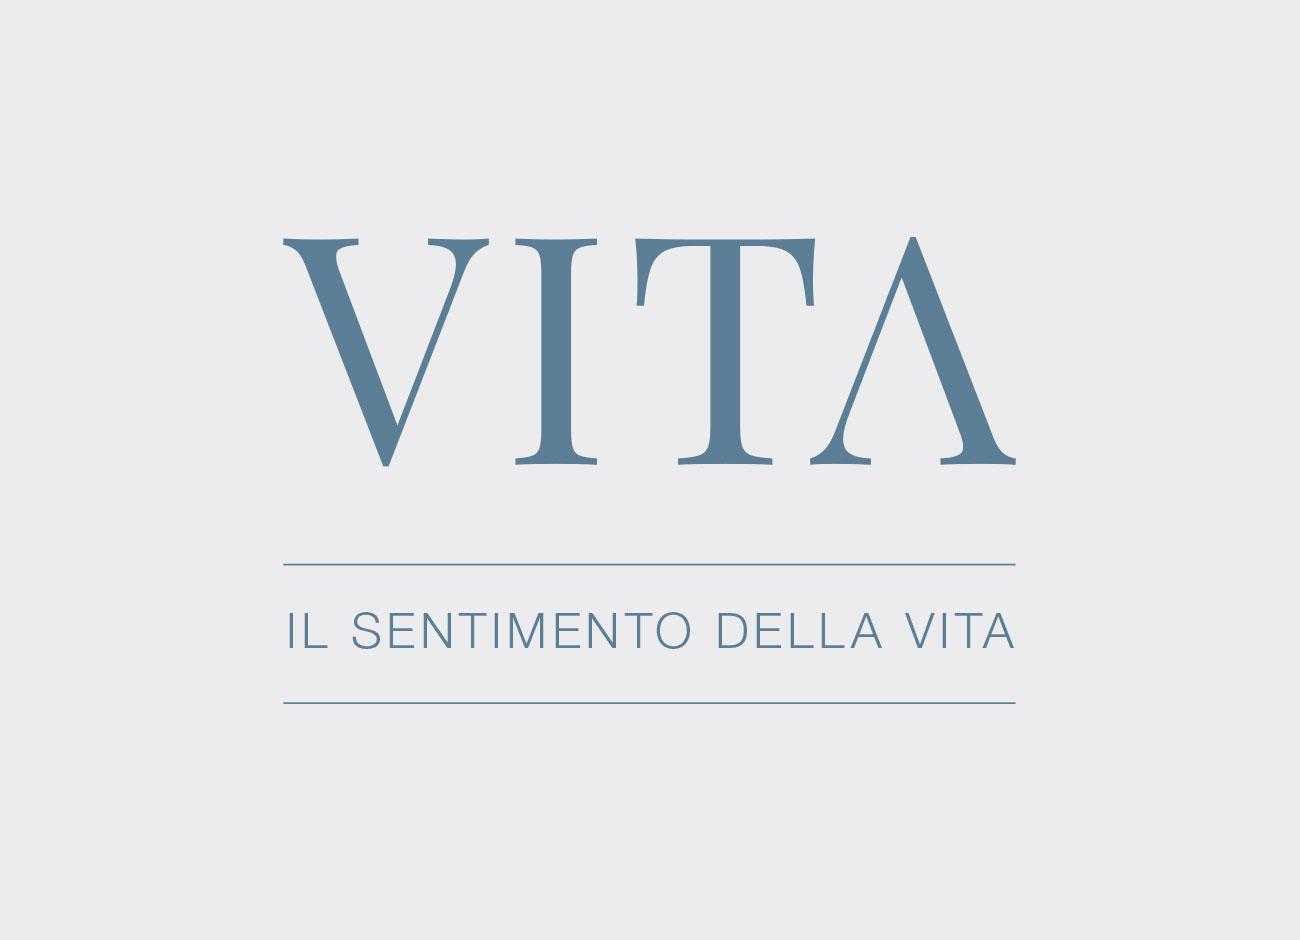 ilemon_newsletter_immo_vita